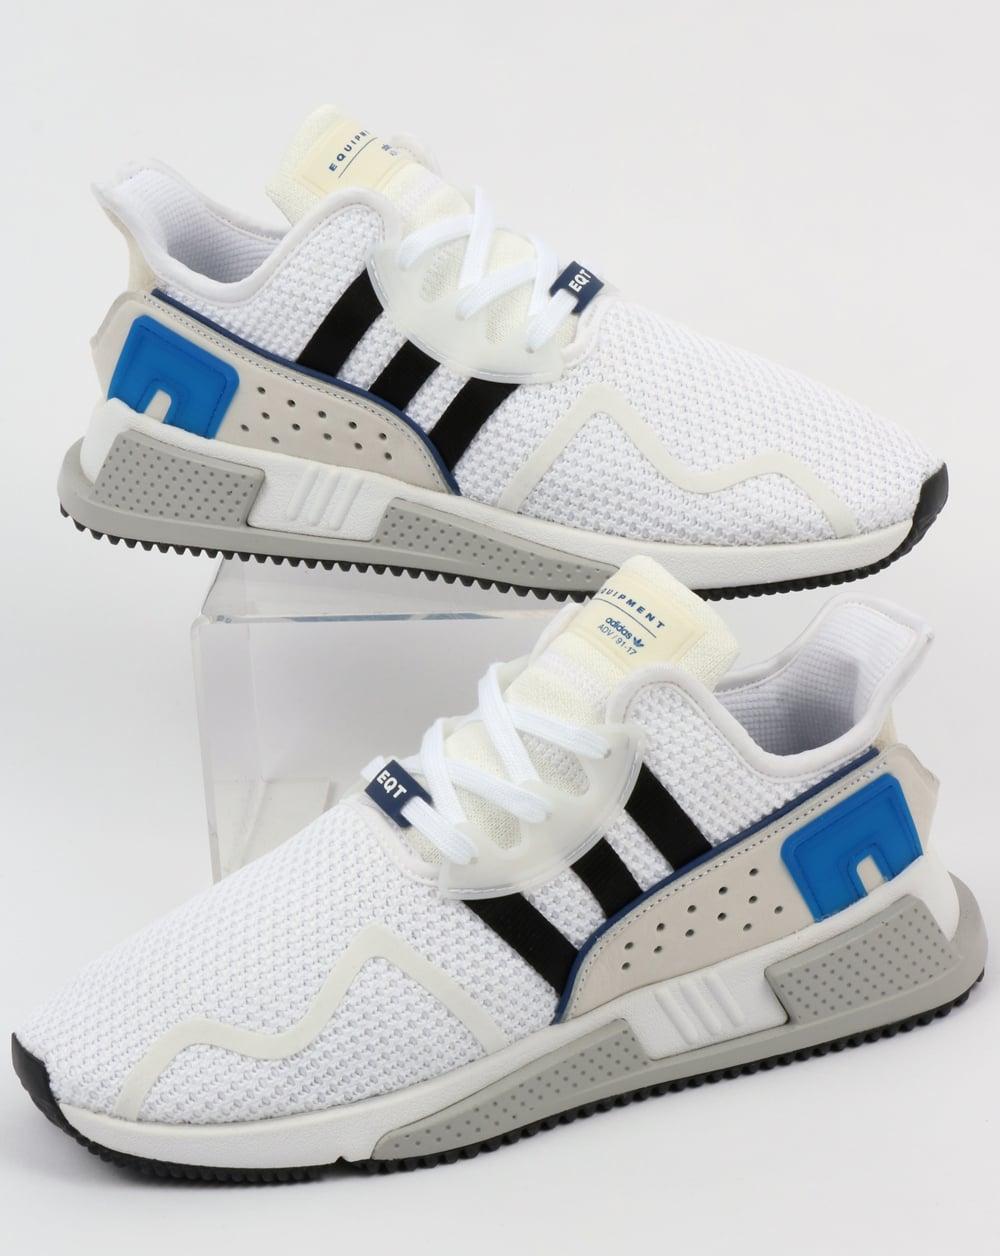 Adidas EQT Cushion ADV Trainers White